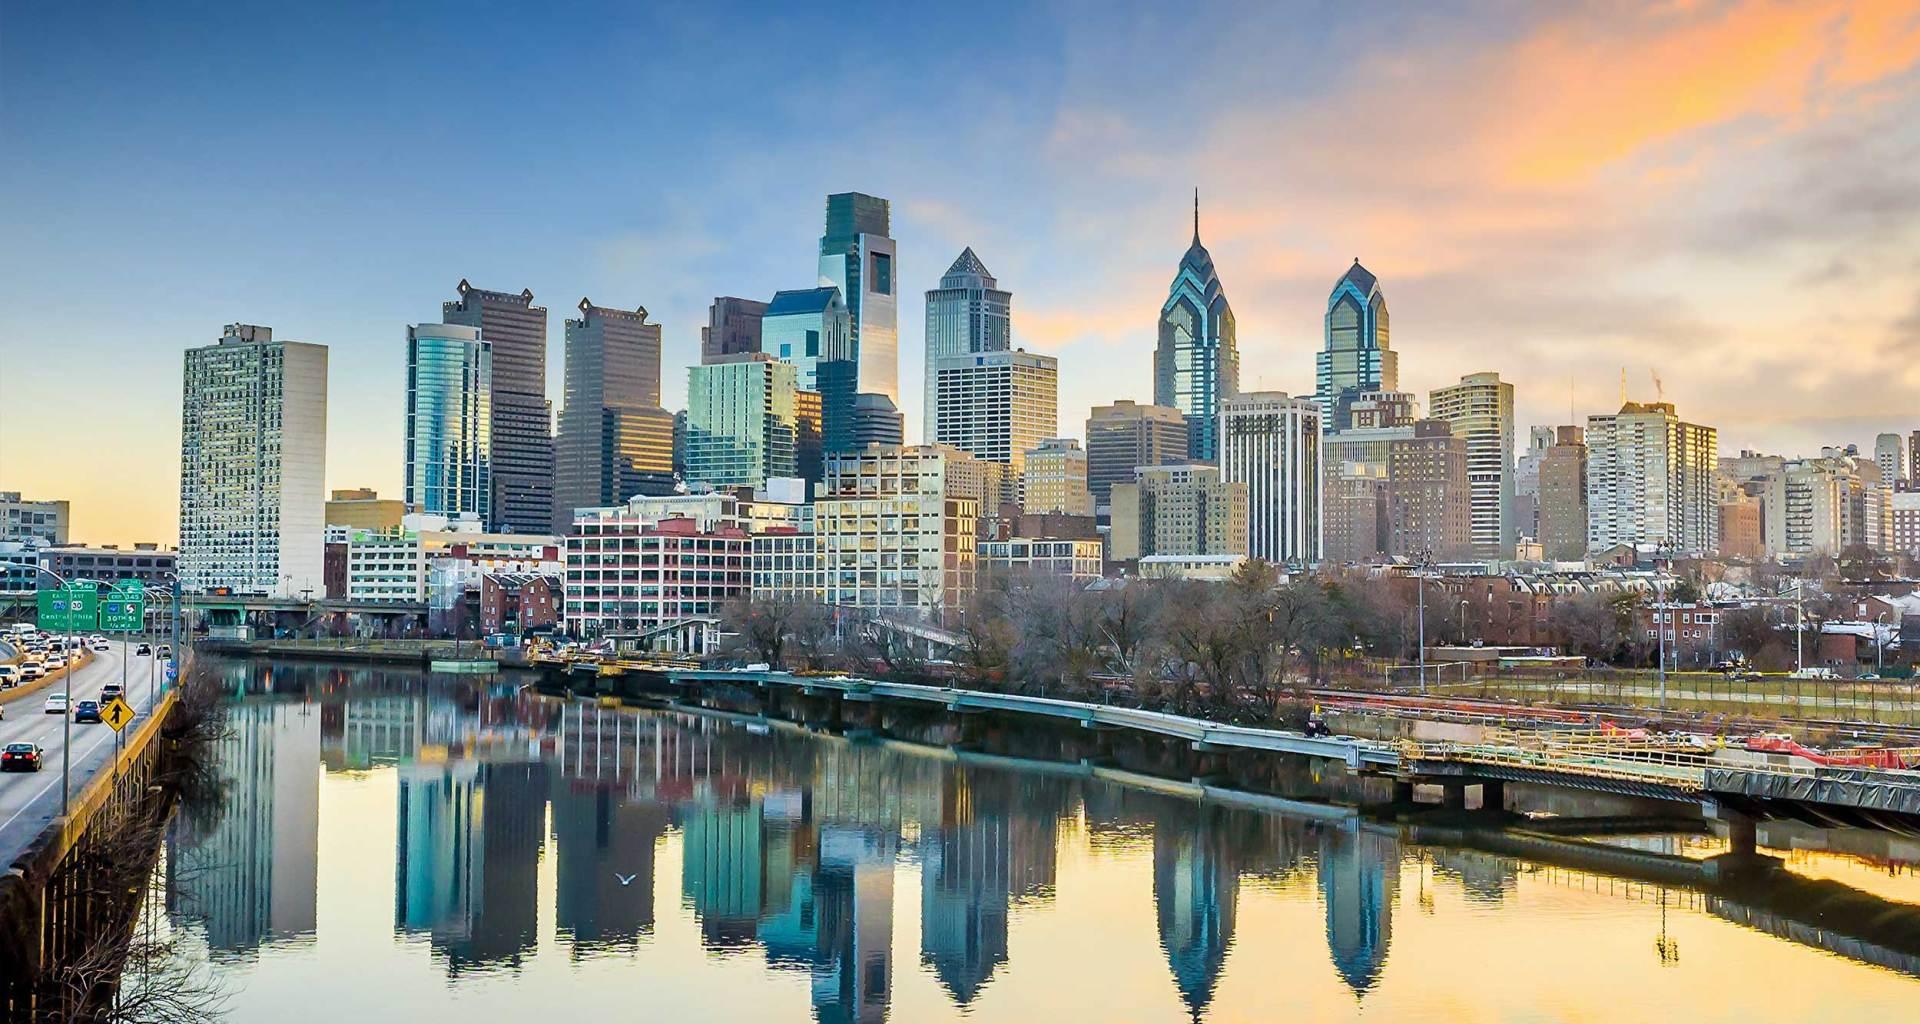 Philadelphia, Pennsylvania skyline.